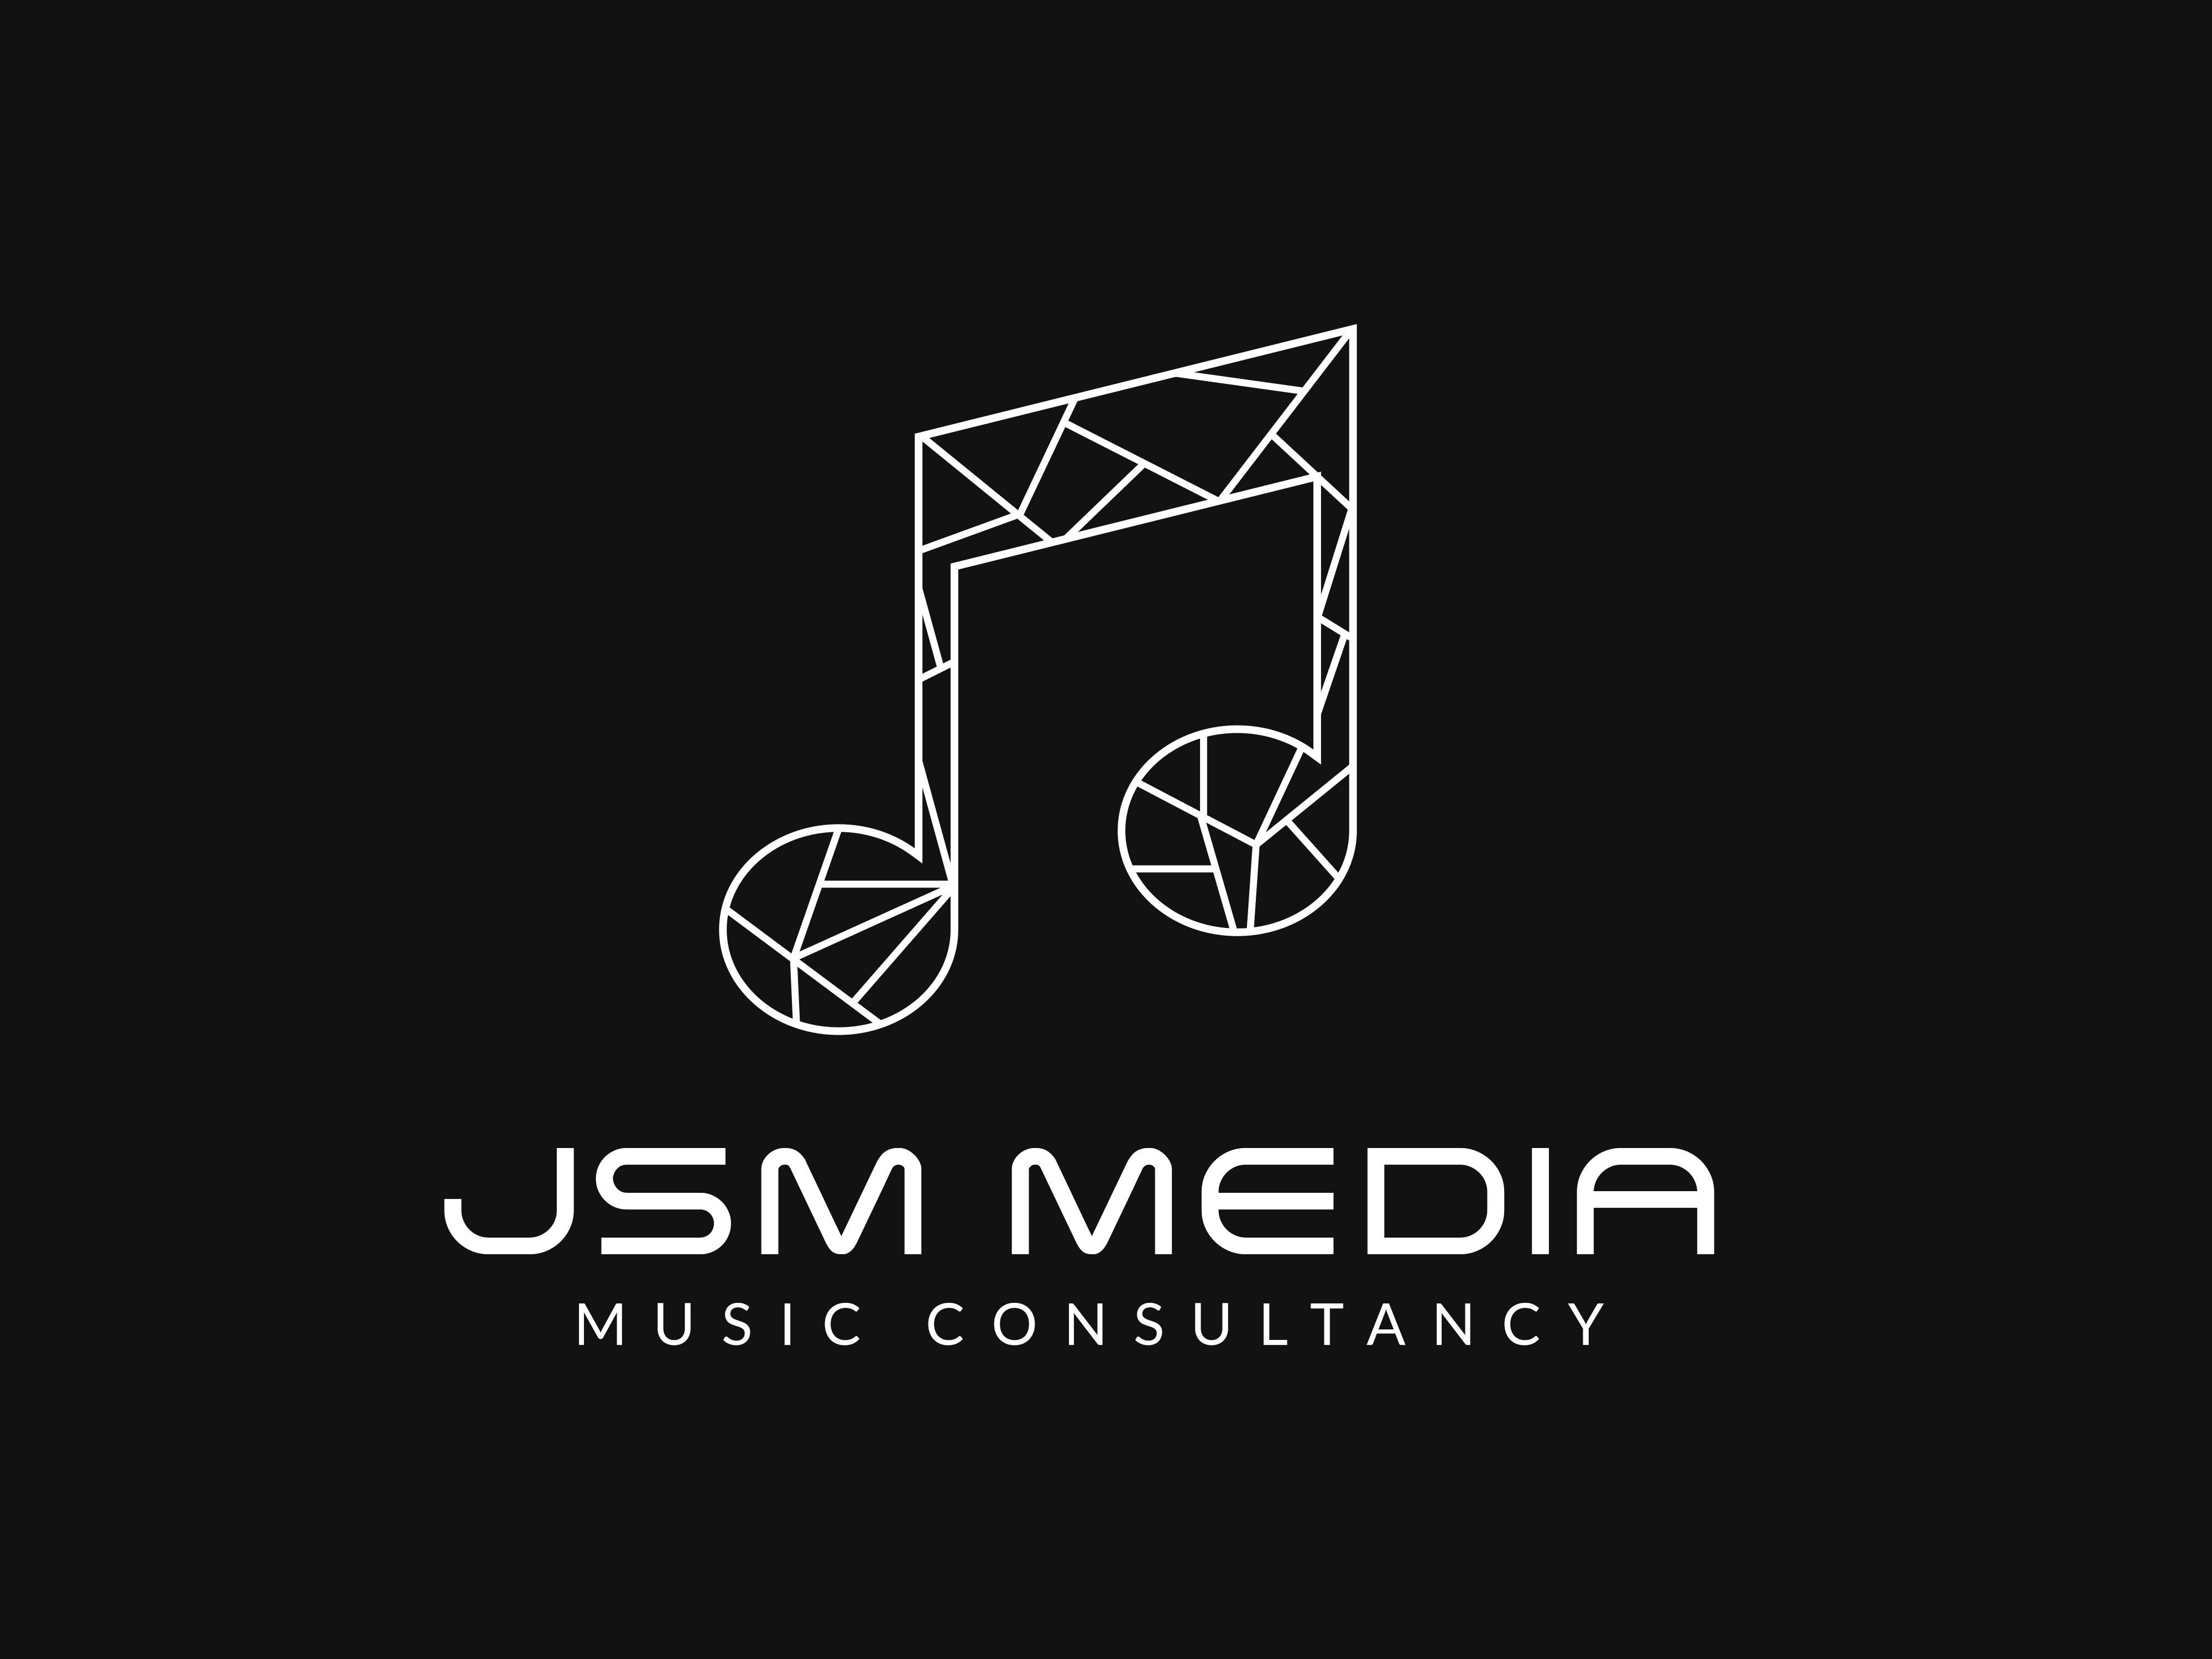 JSM MEDIA